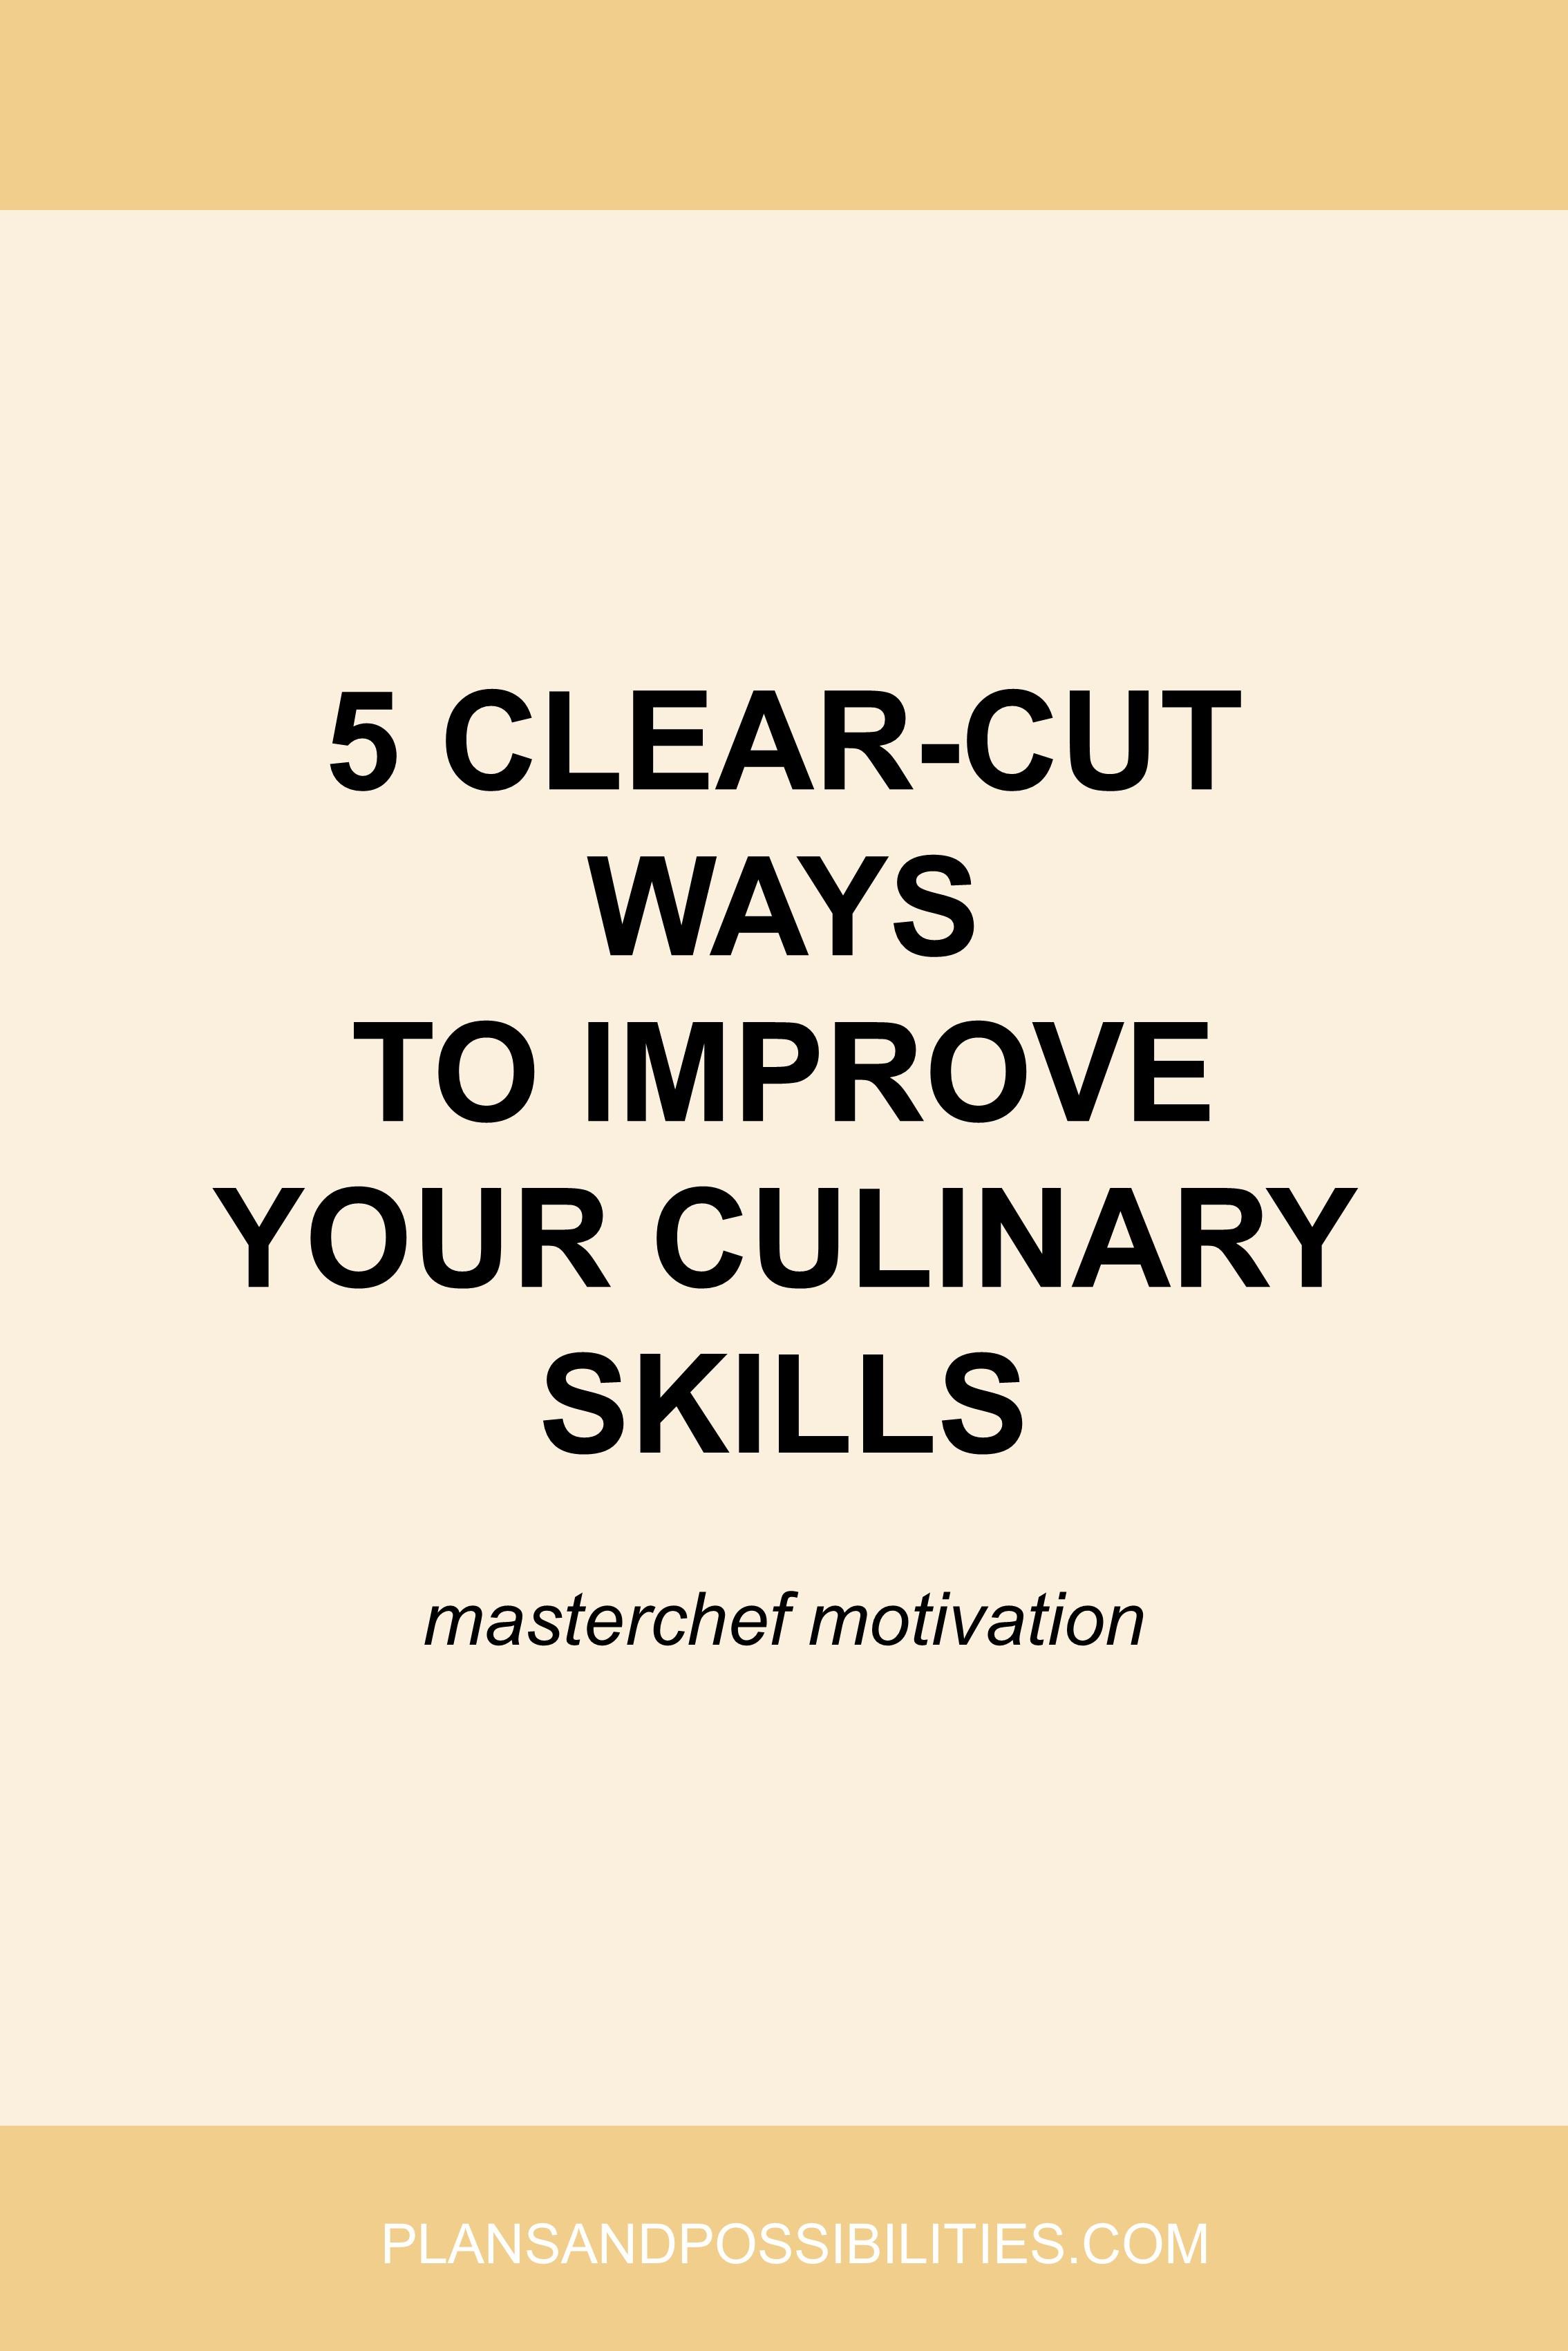 5 Clear Cut Ways To Improve Your Culinary Skills.jpg